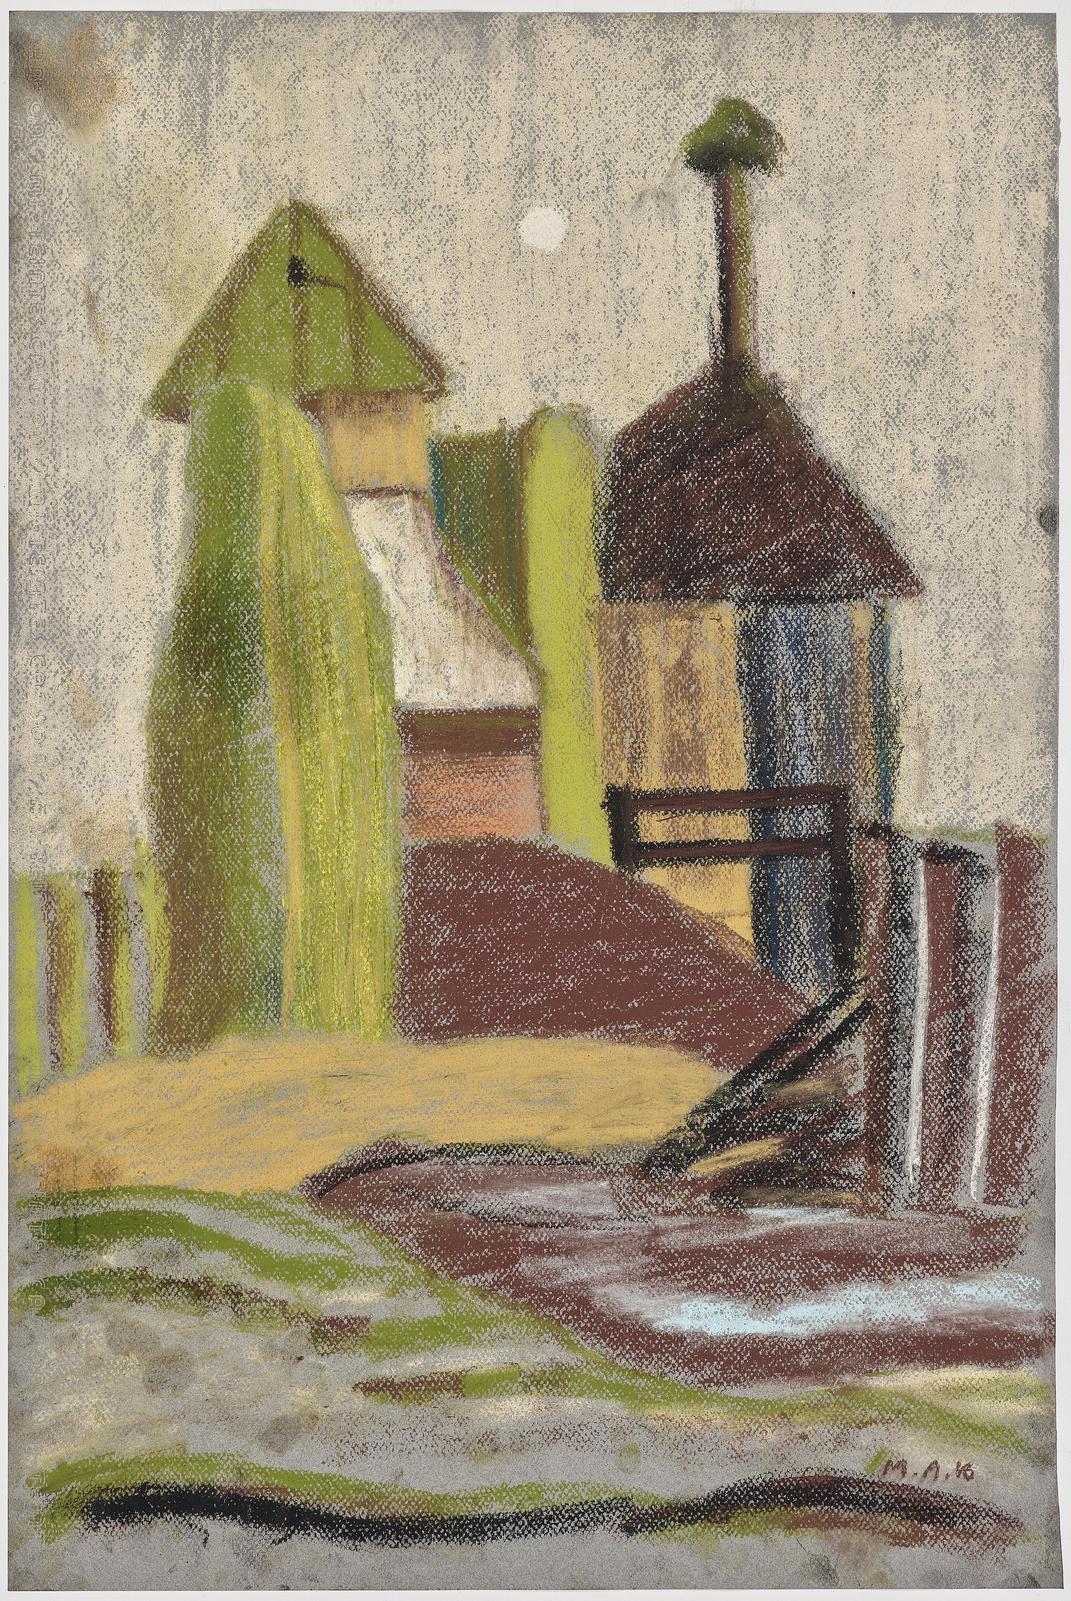 Milos Alexander Bazovsky - Landschaft Mit Hausern (Landscape with houses)-